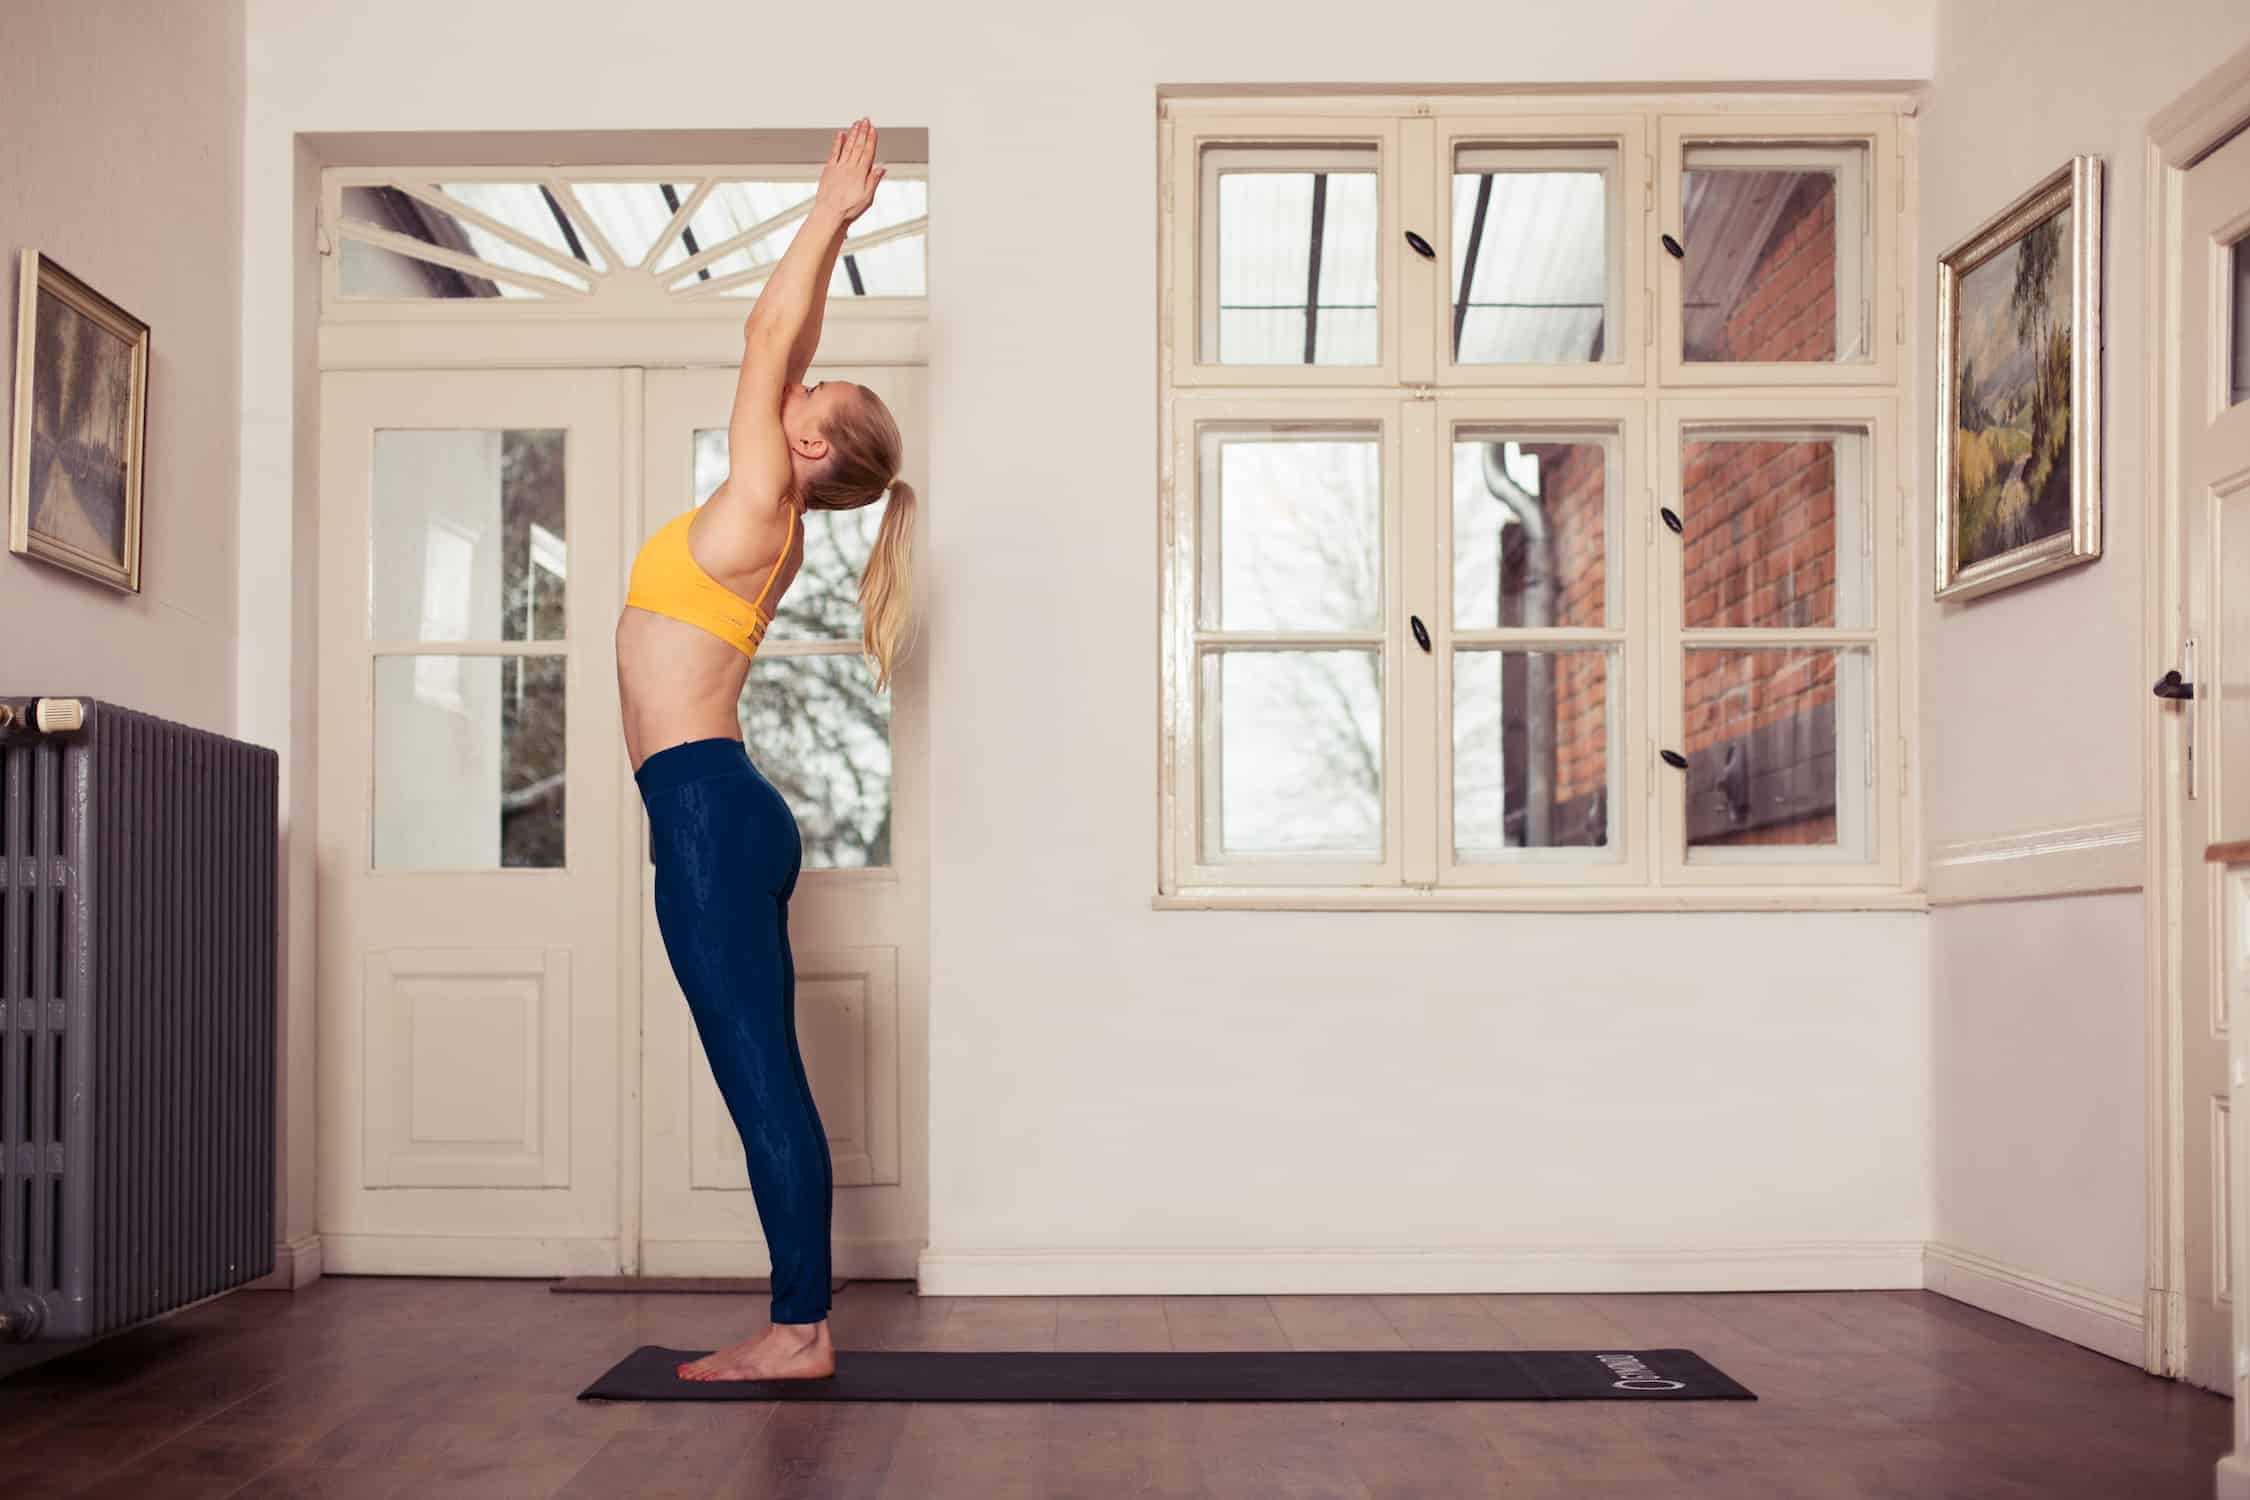 Frau macht Yoga gestreckter Berg